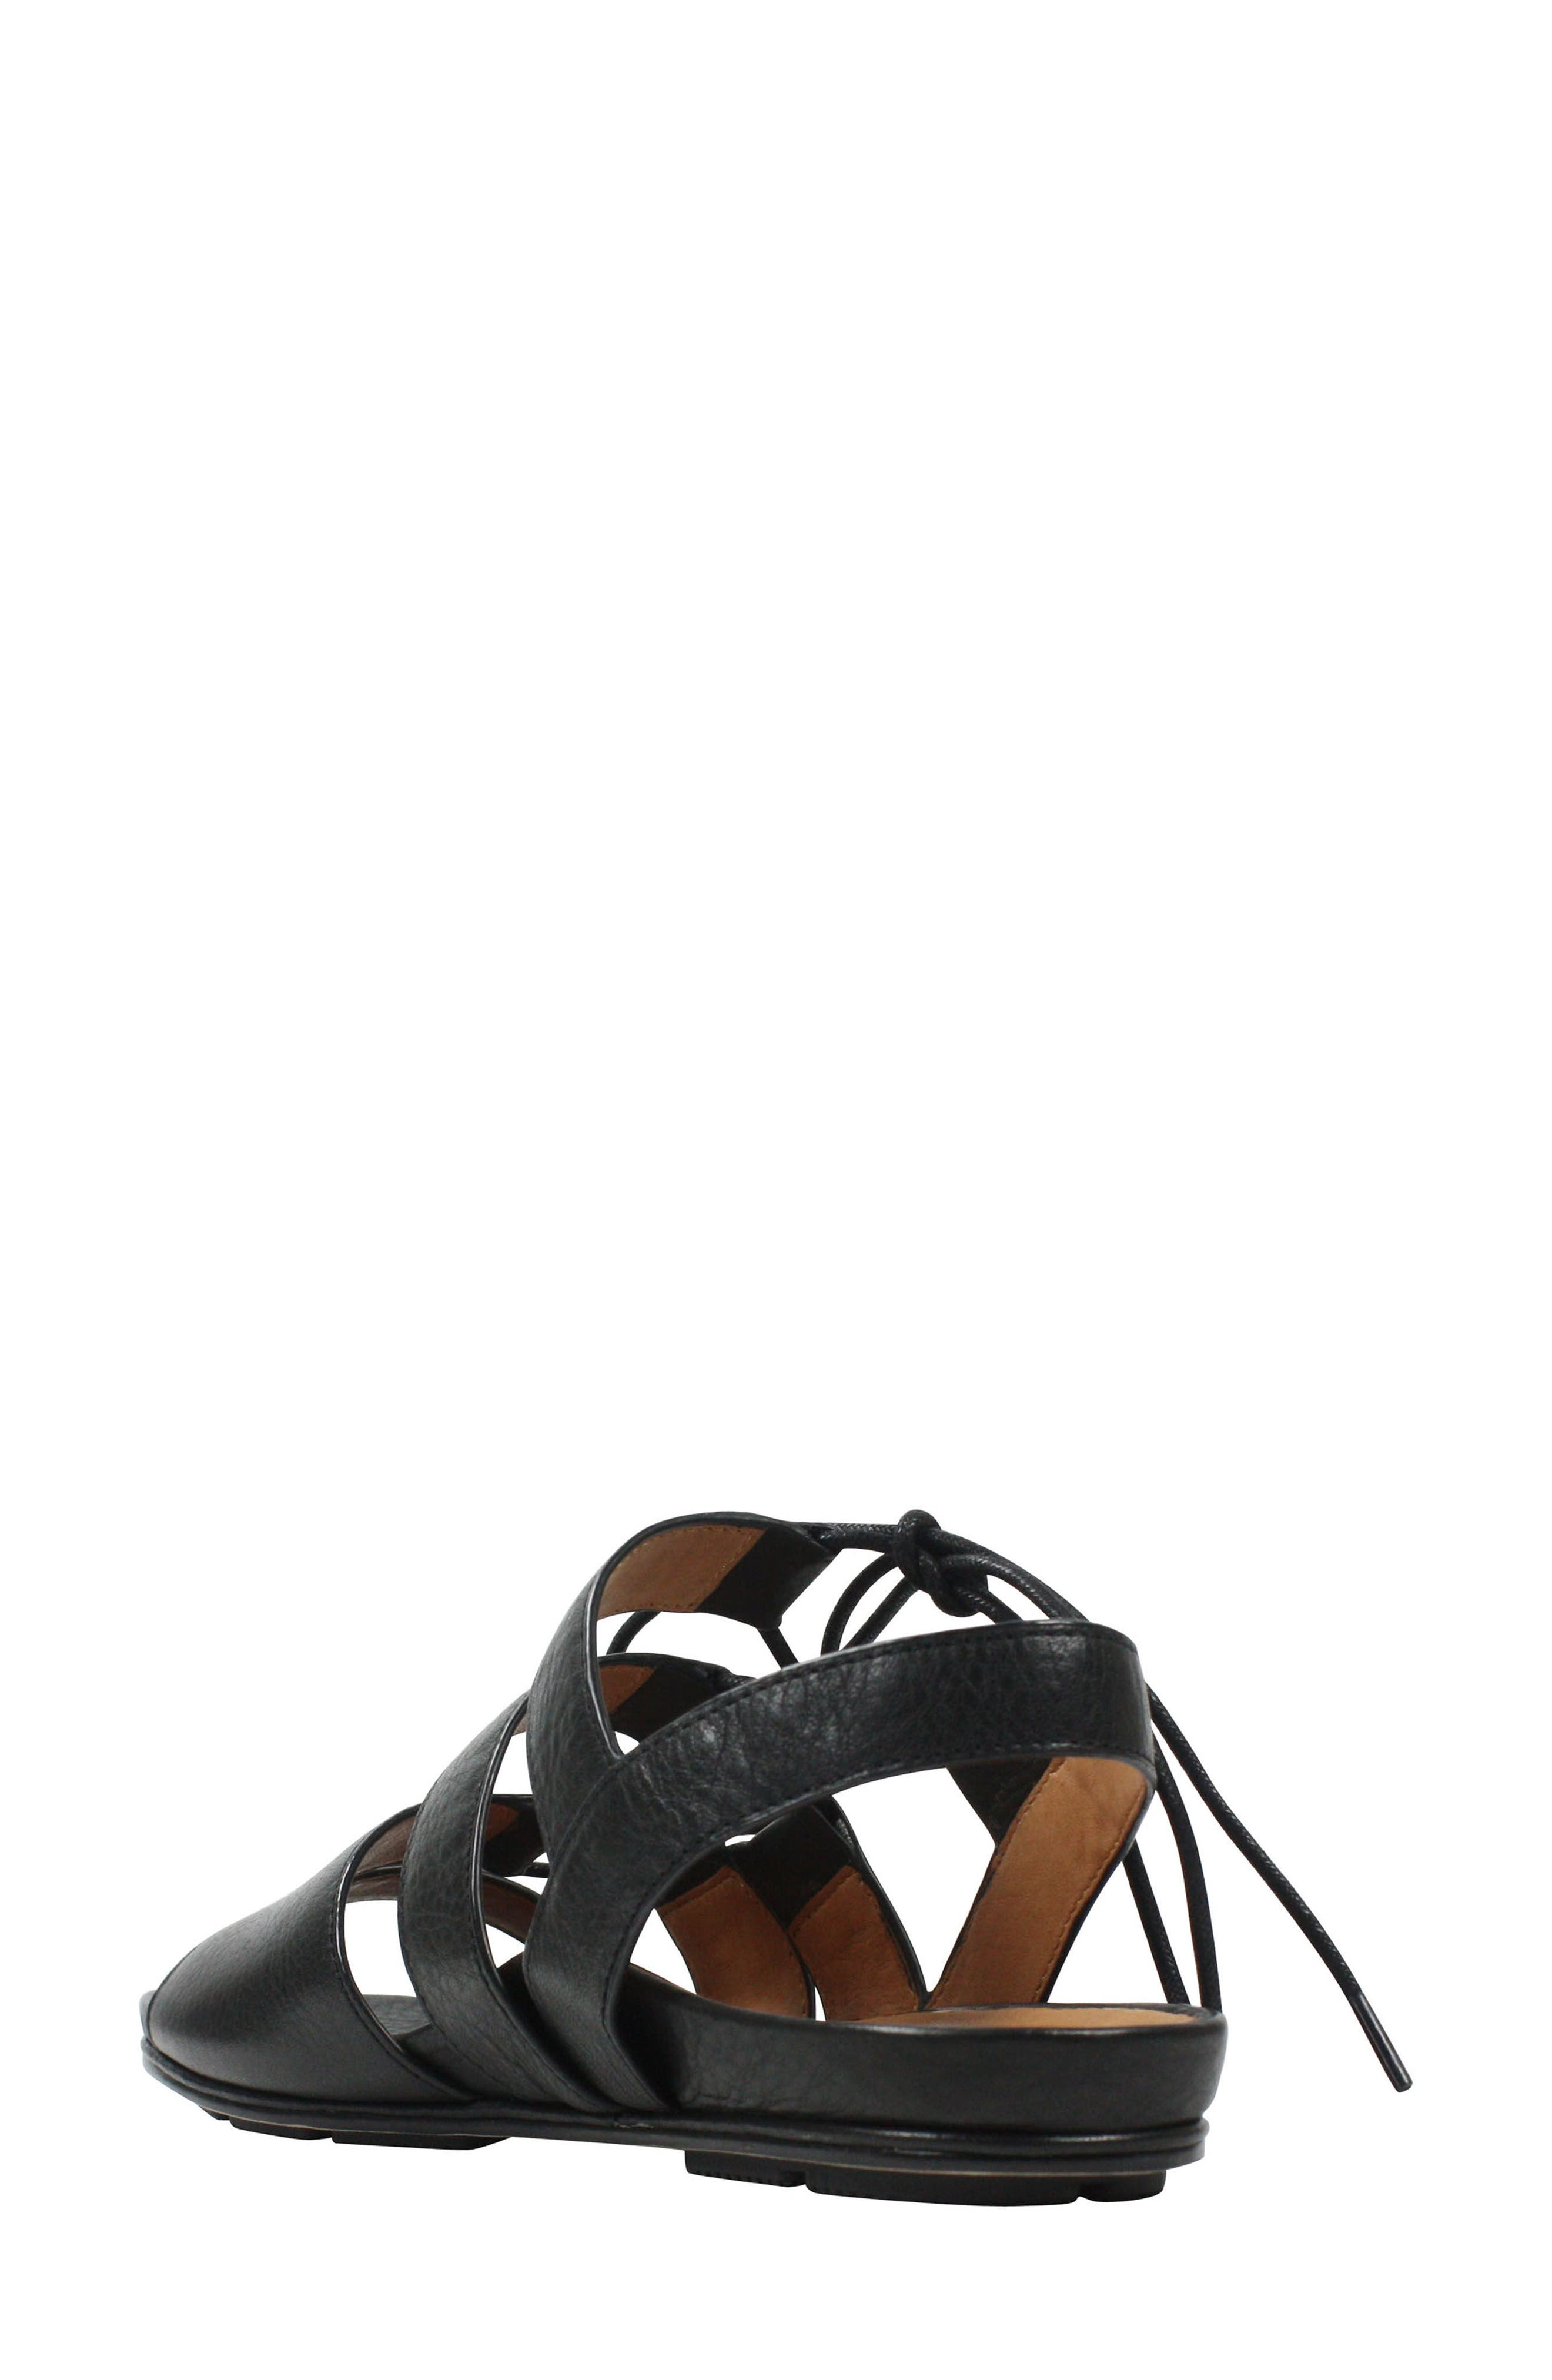 Digbee Sandal,                             Alternate thumbnail 2, color,                             BLACK LEATHER